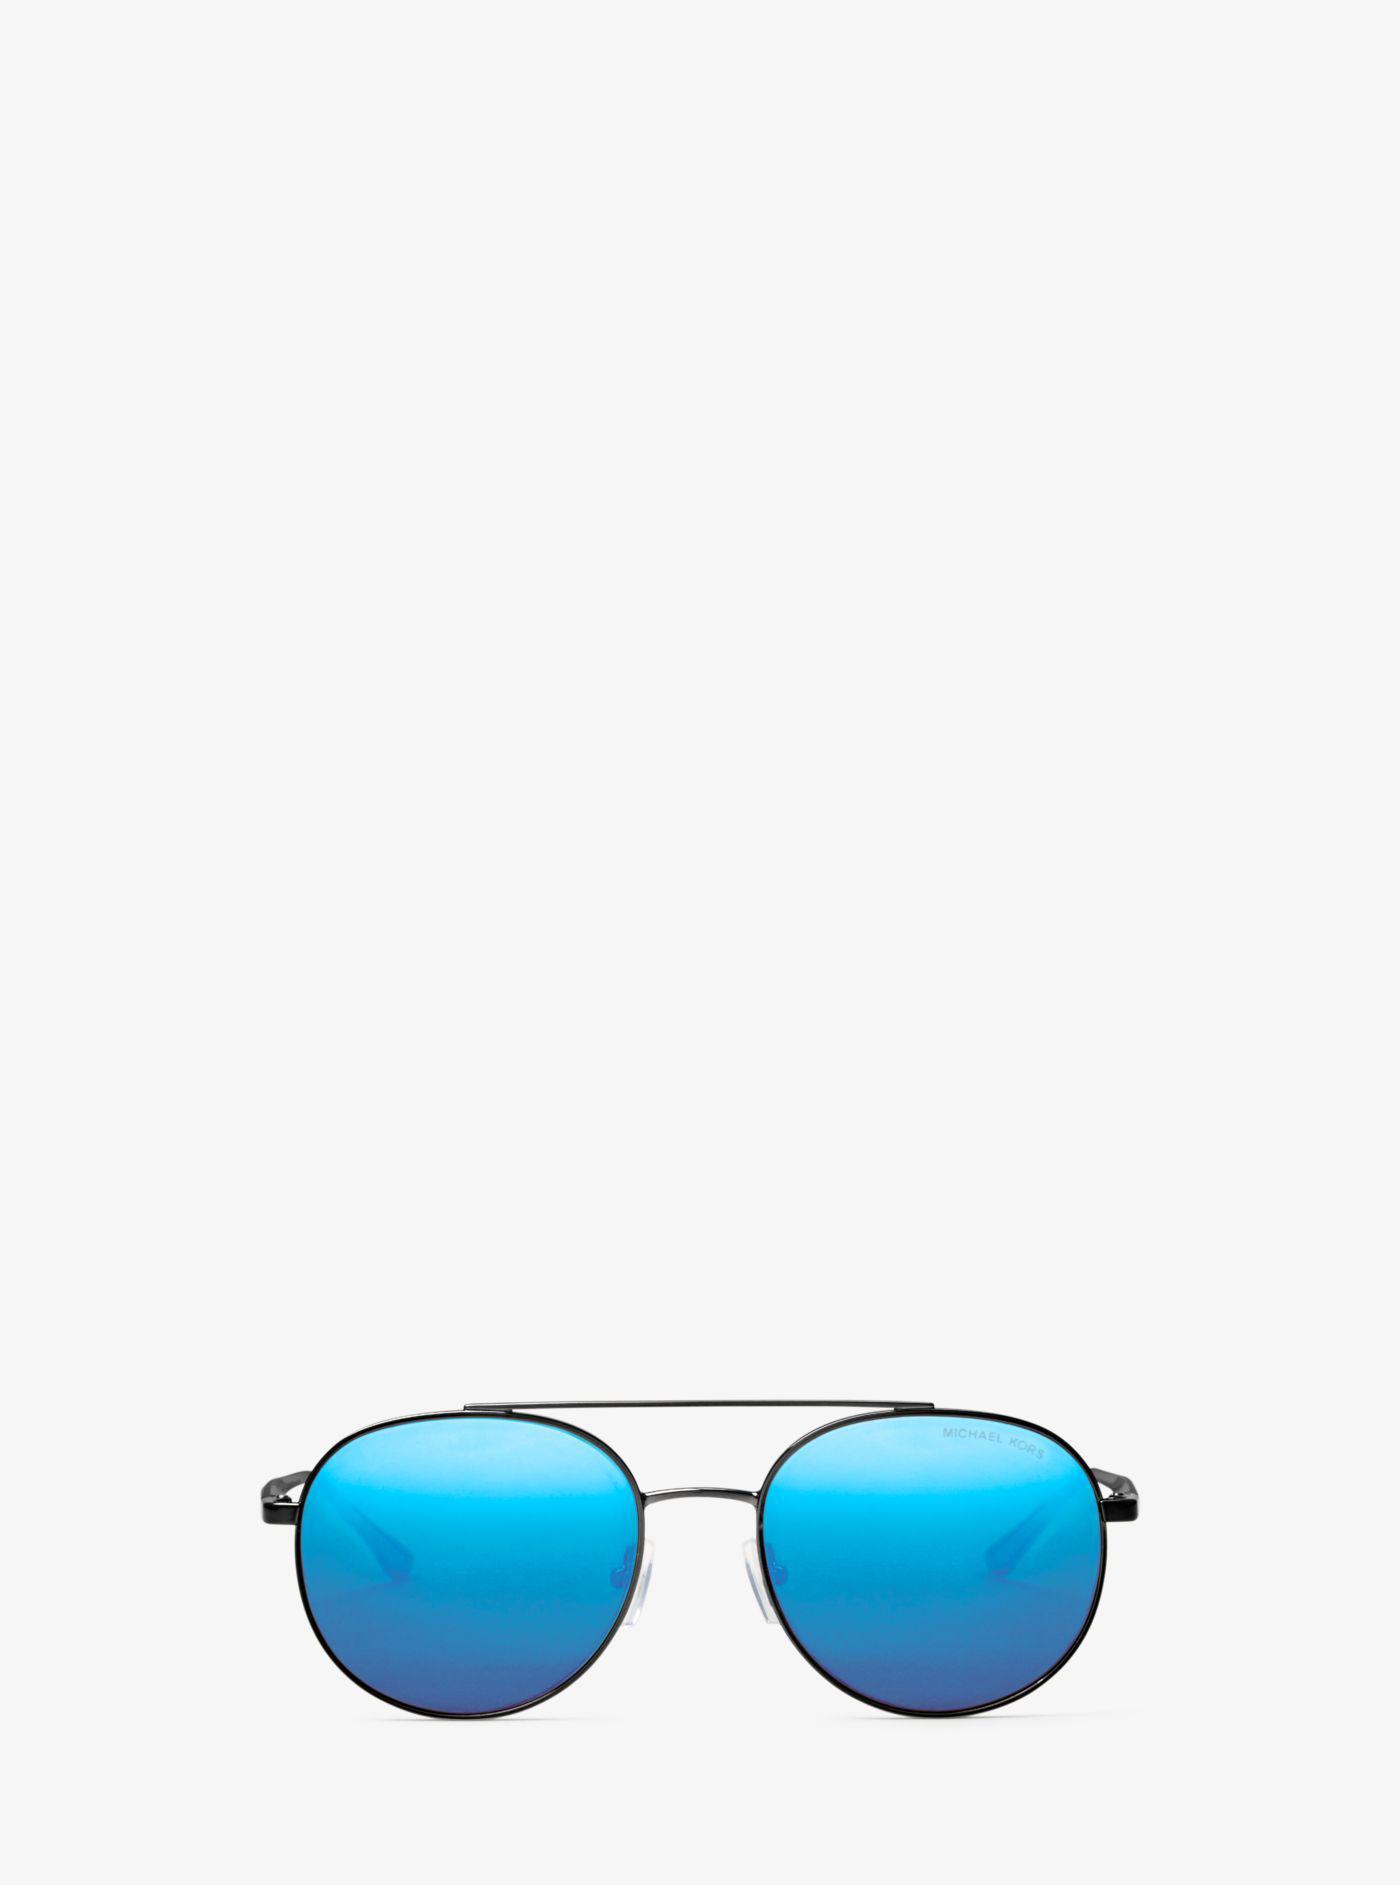 7910c1819c Lyst - Michael Kors Lon Rounded Aviator Sunglasses in Blue